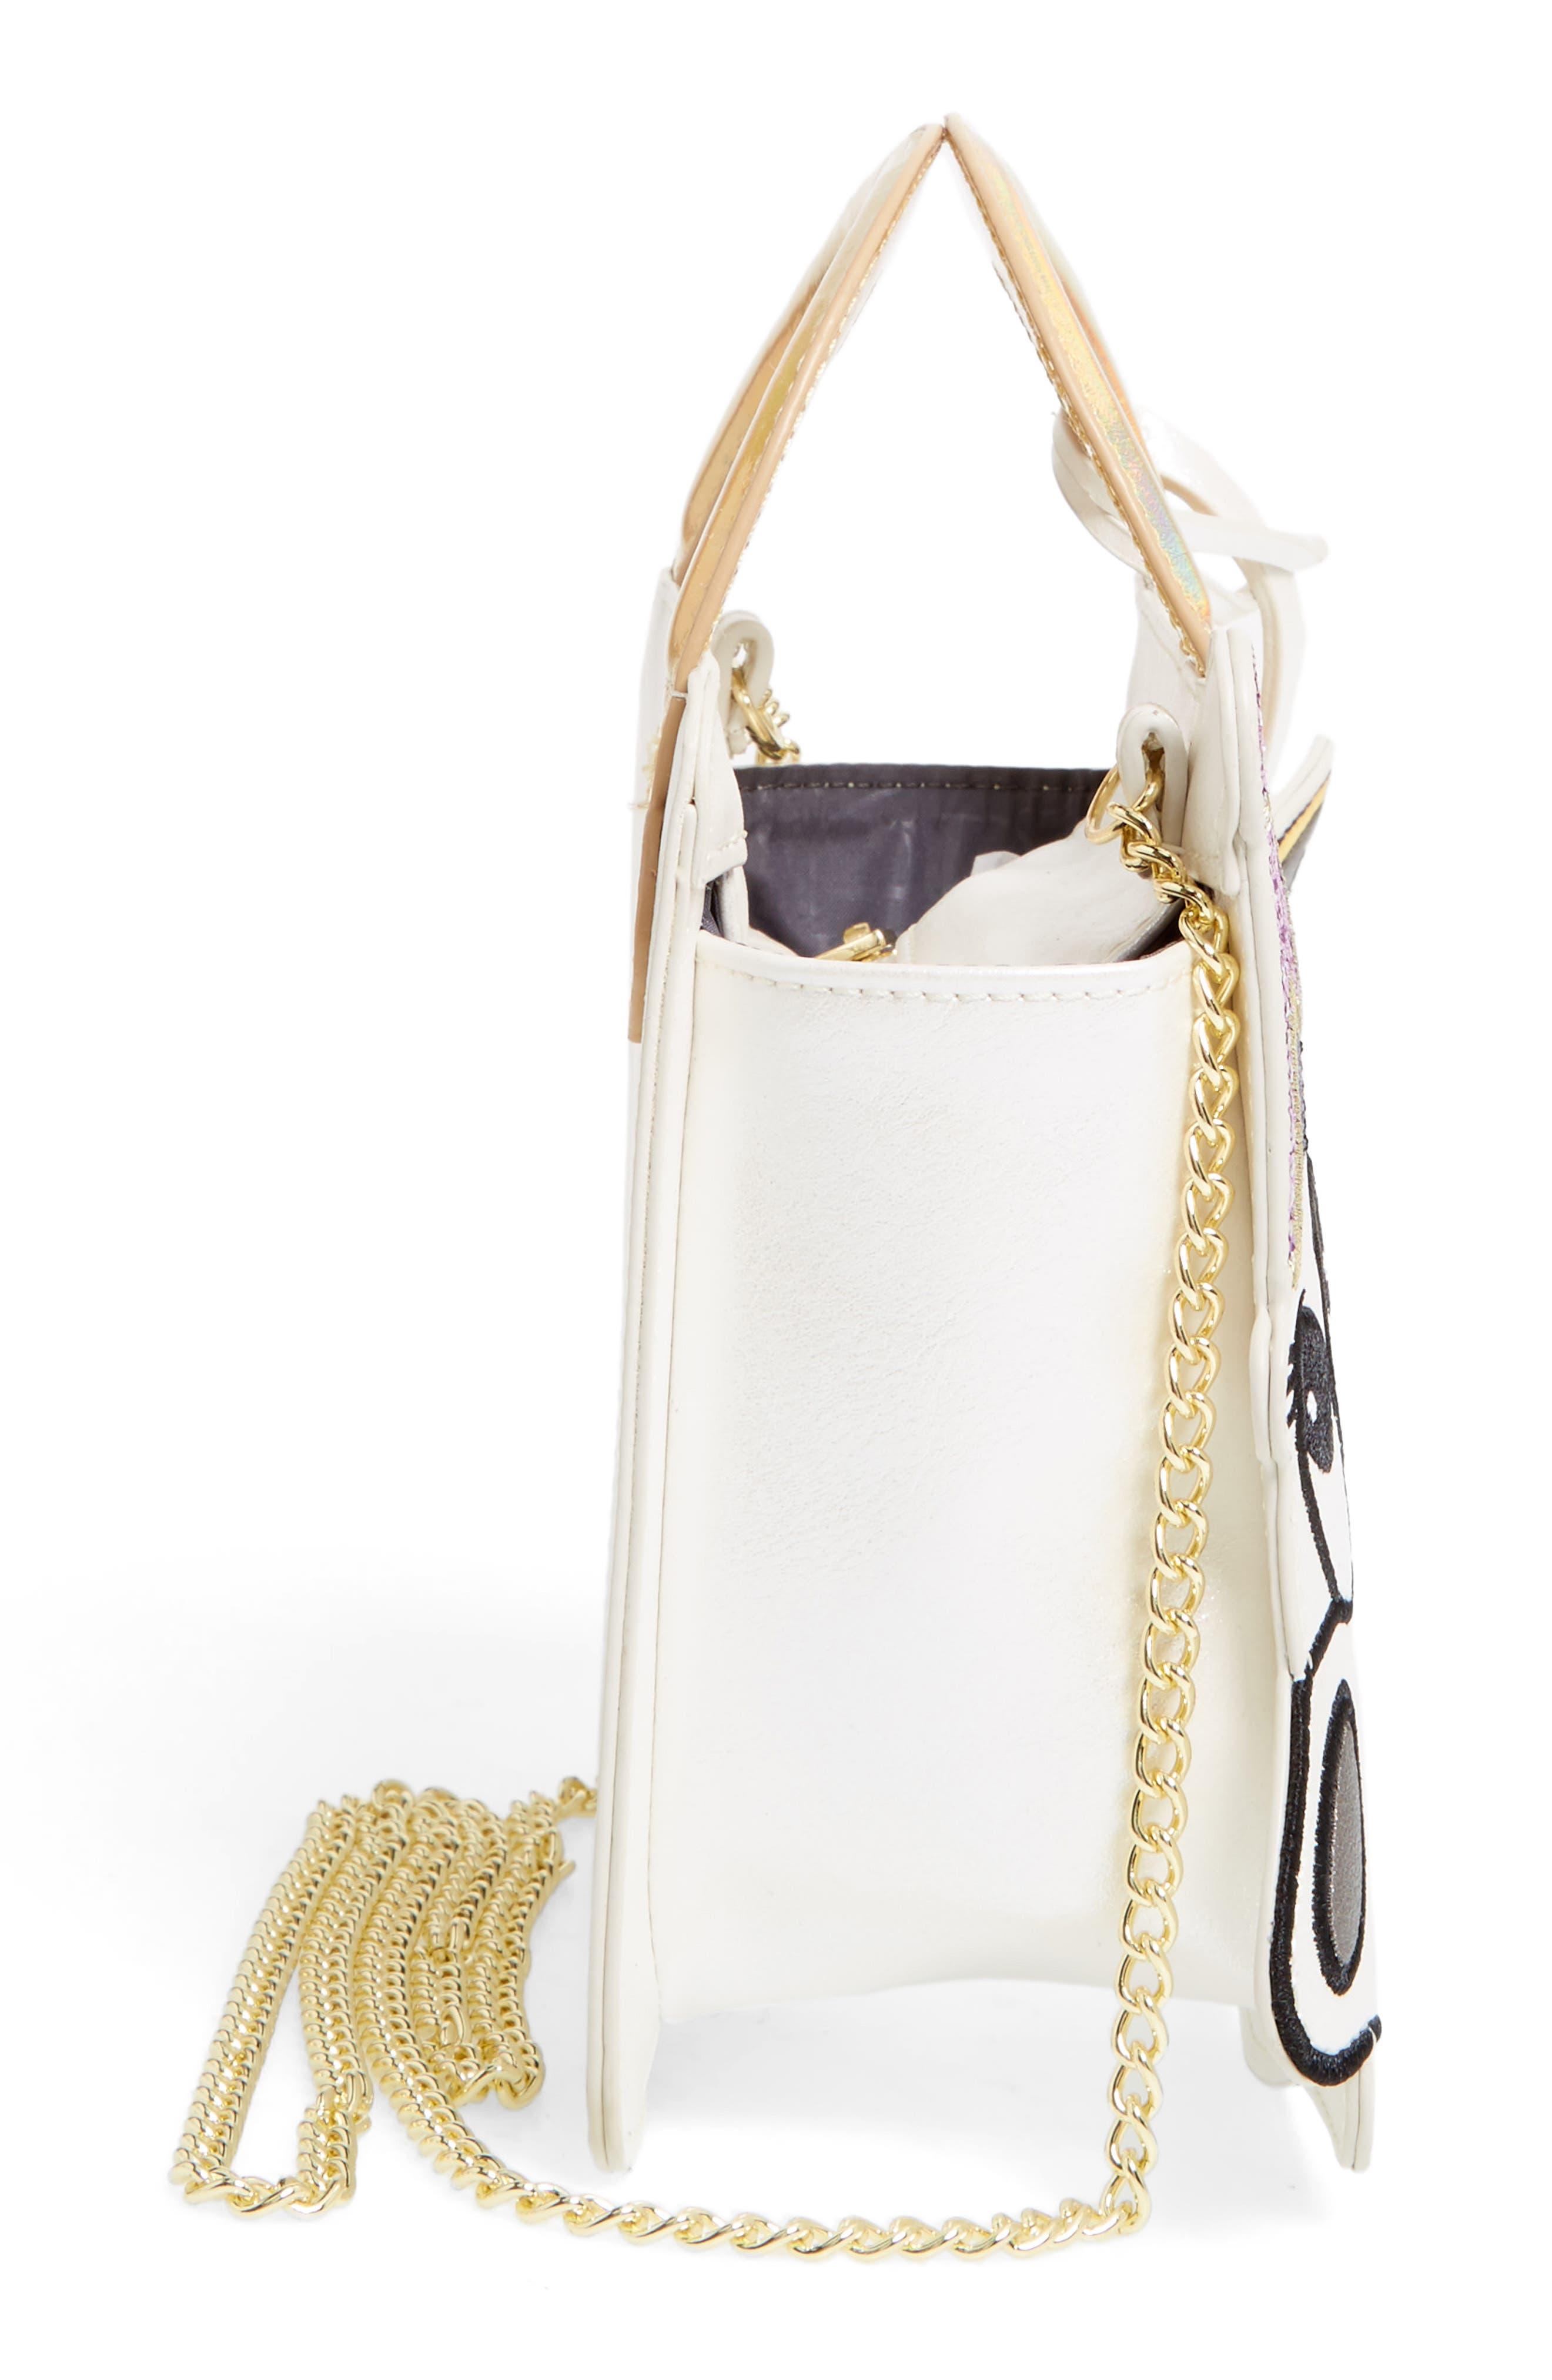 DANIELLE NICOLE,                             x Disney<sup>®</sup> Mrs. Potts & Chip Faux Leather Crossbody Bag,                             Alternate thumbnail 5, color,                             040